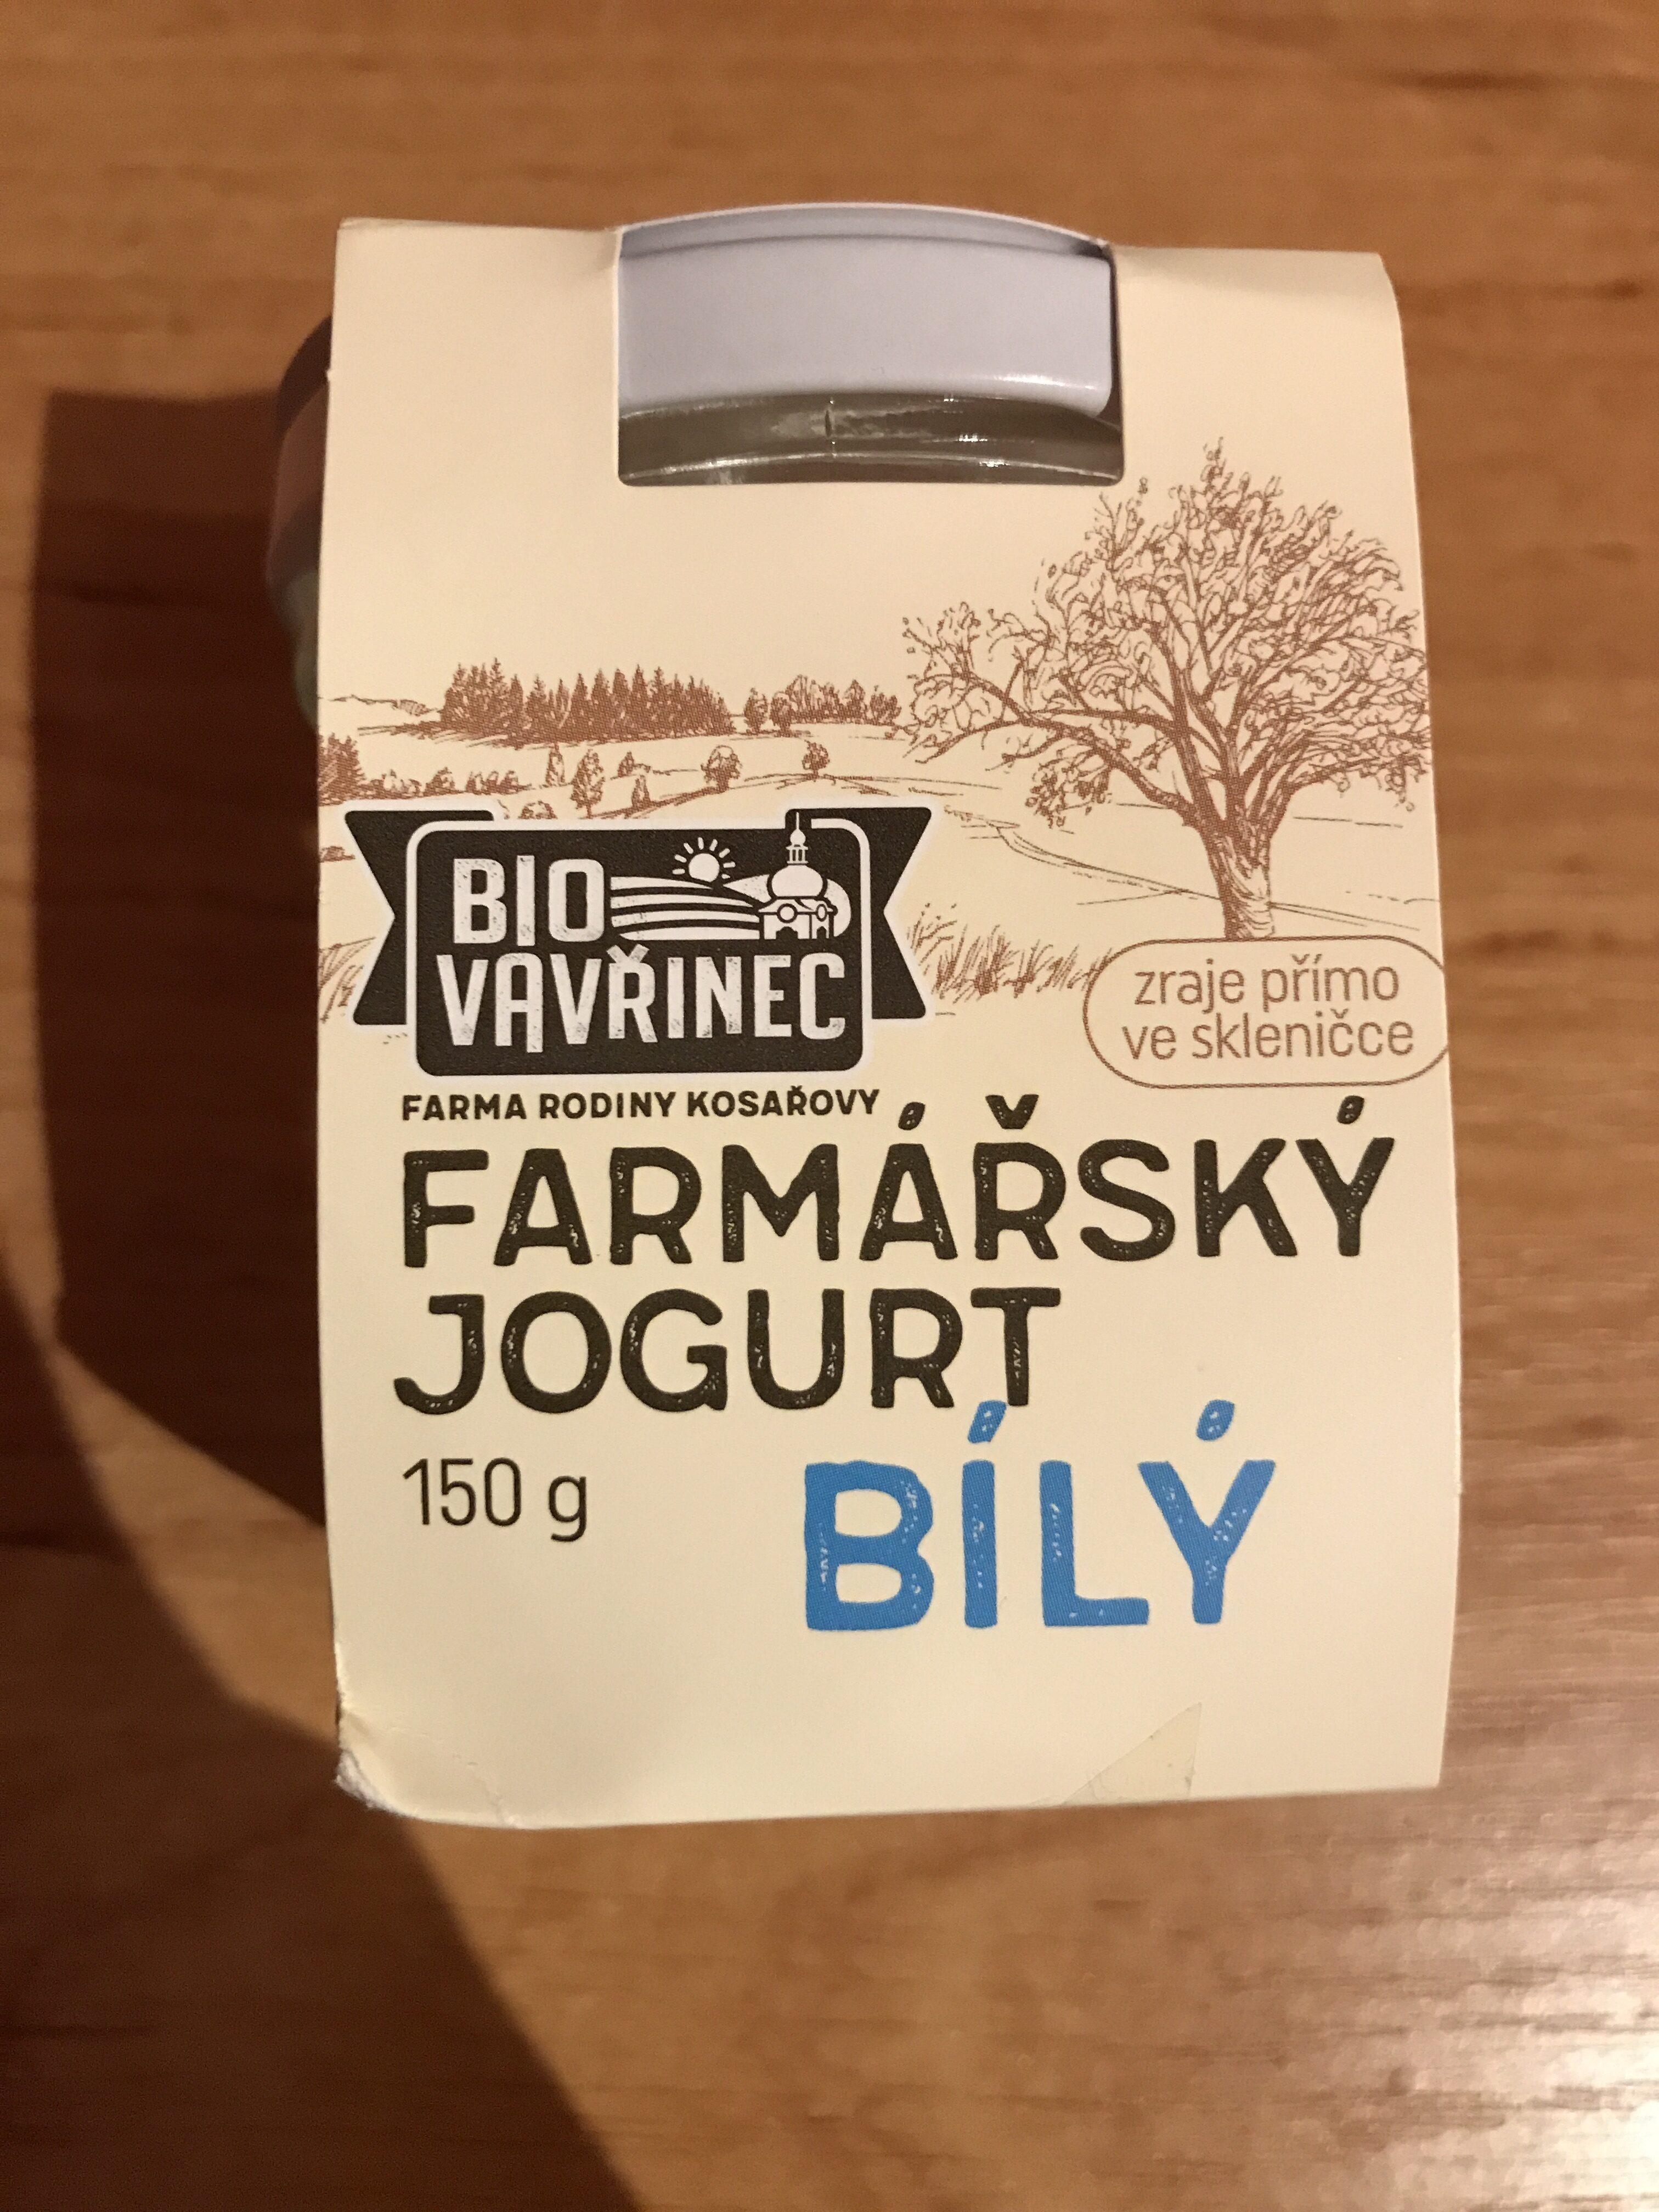 Farmářský jogurt bílý BIO - Product - cs